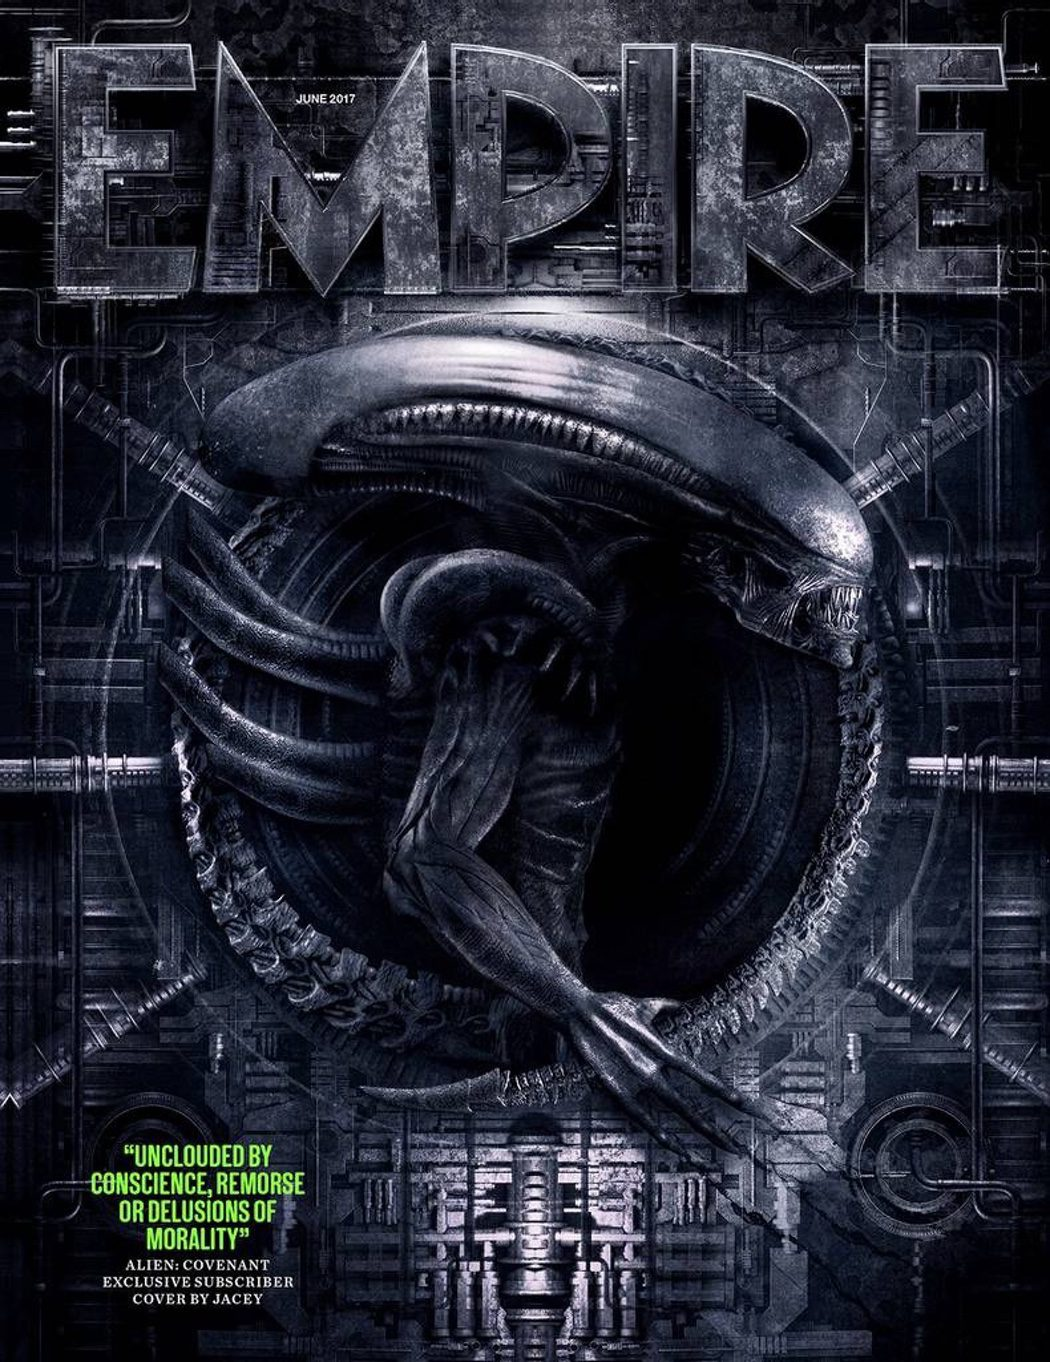 Espectacular diseño del Xenomorfo para 'Alien: Covenant'